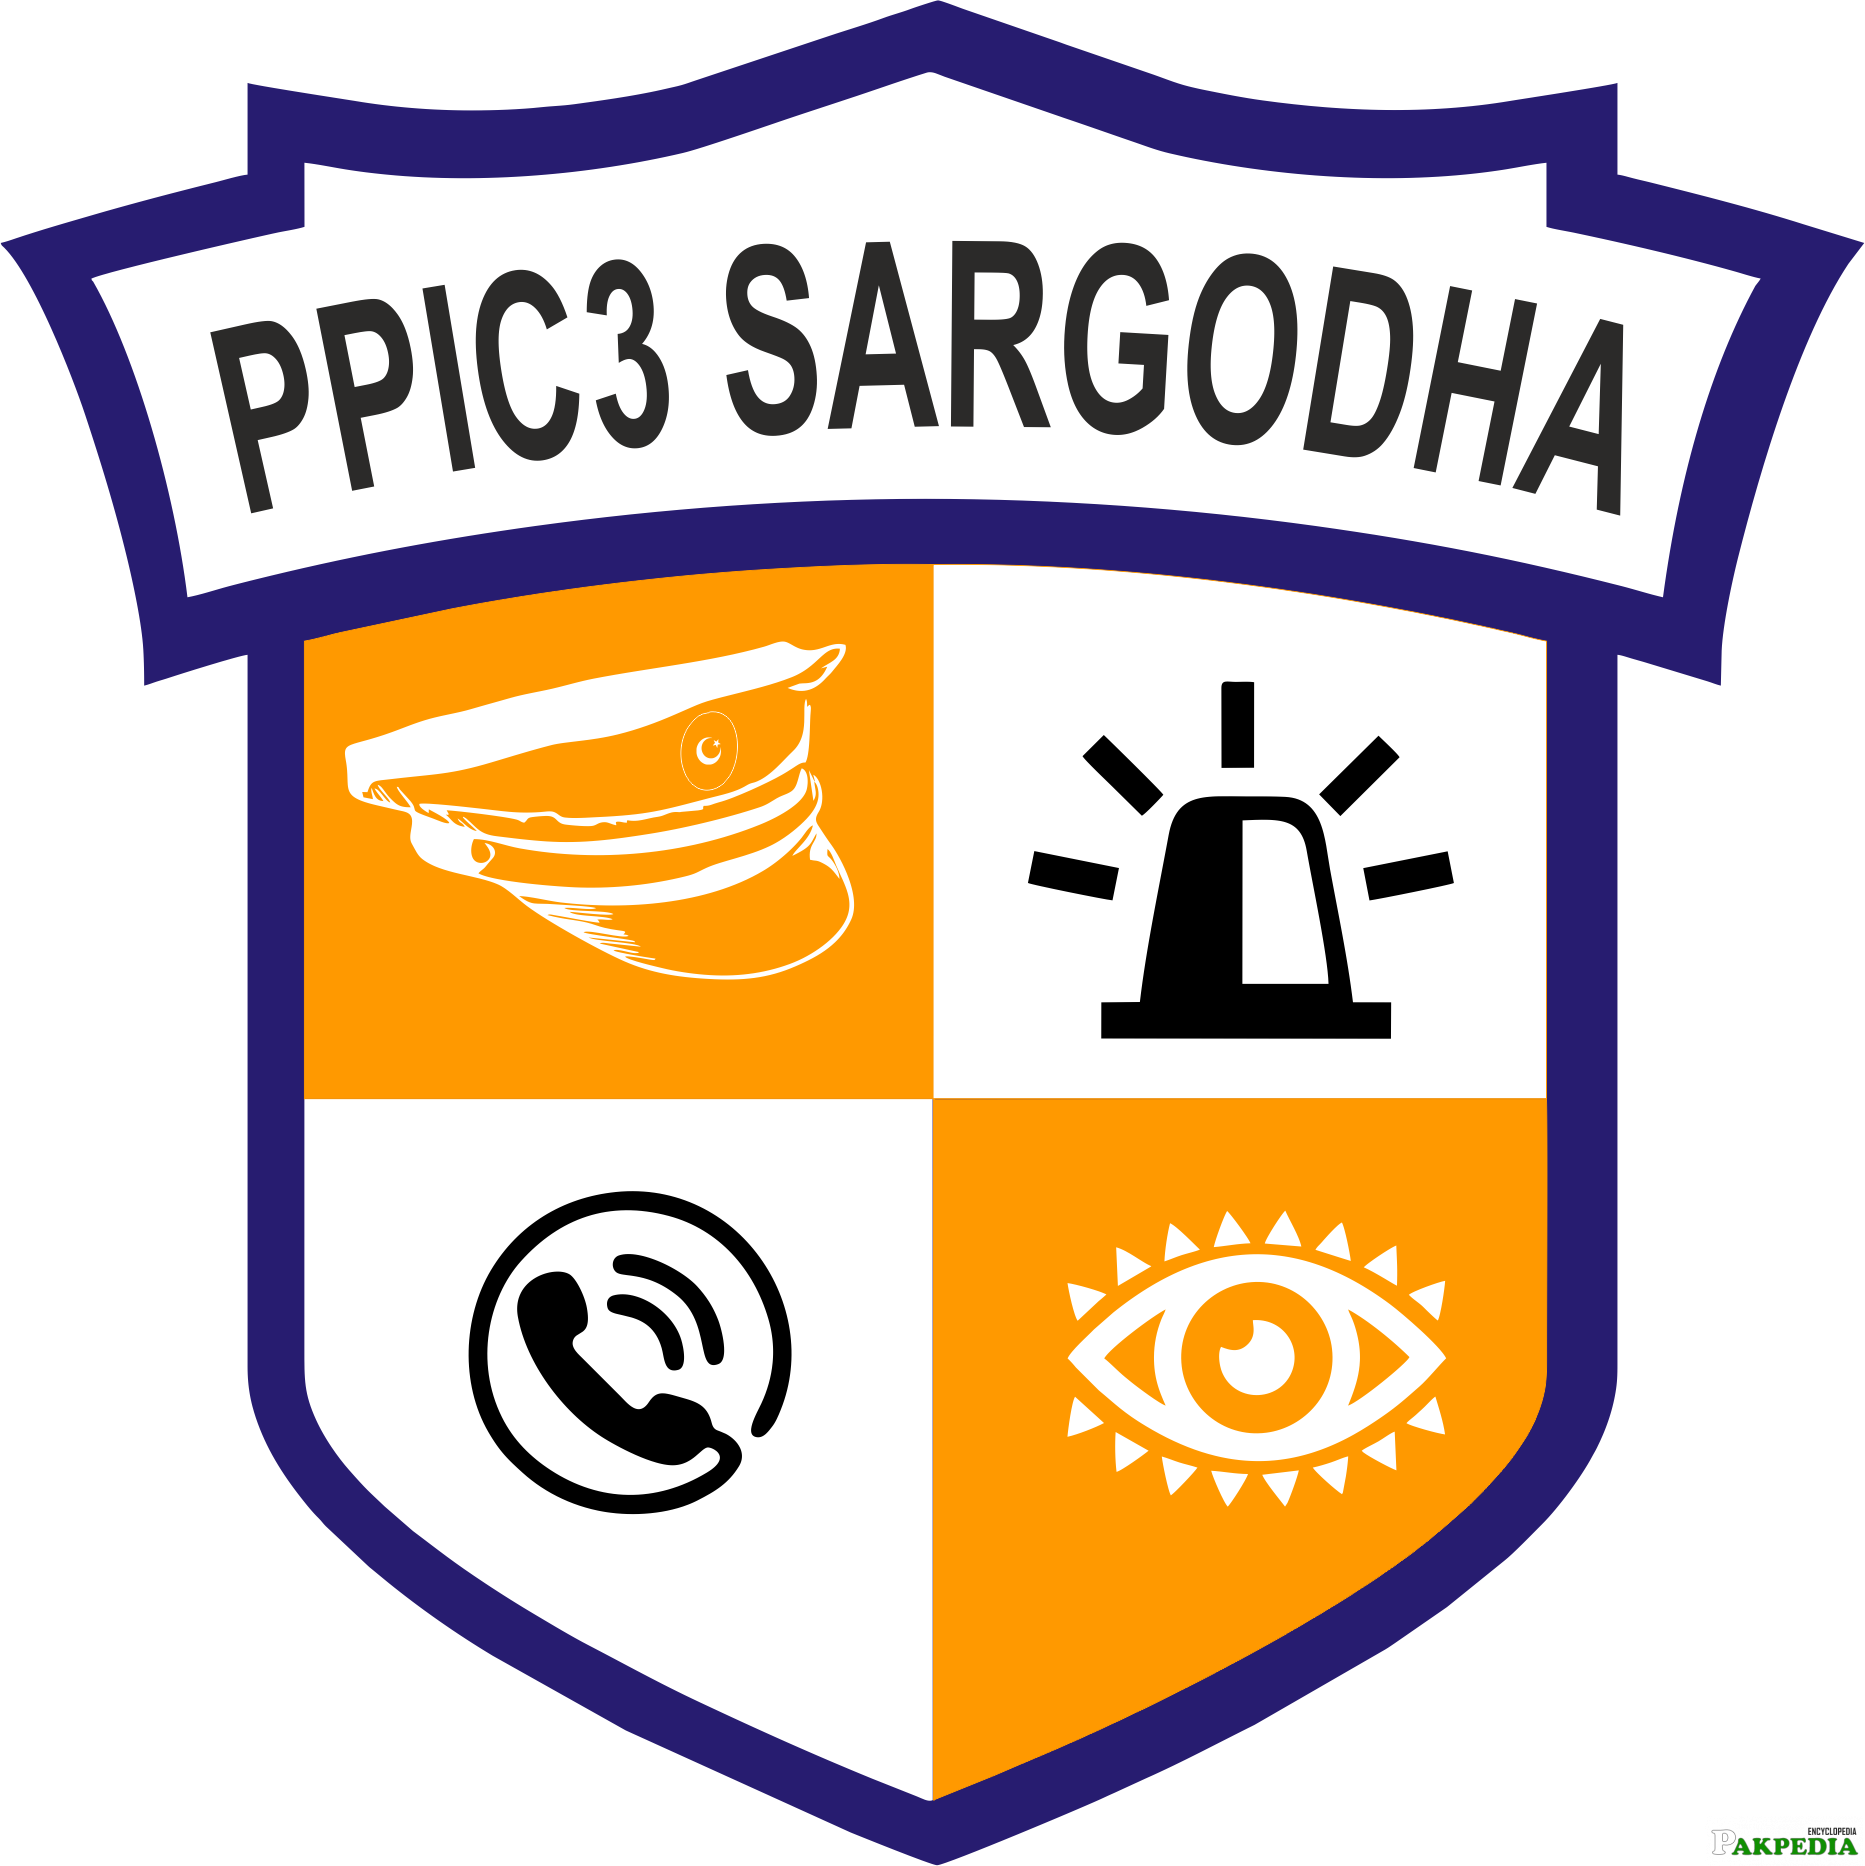 Logos of PSCA Sargodha